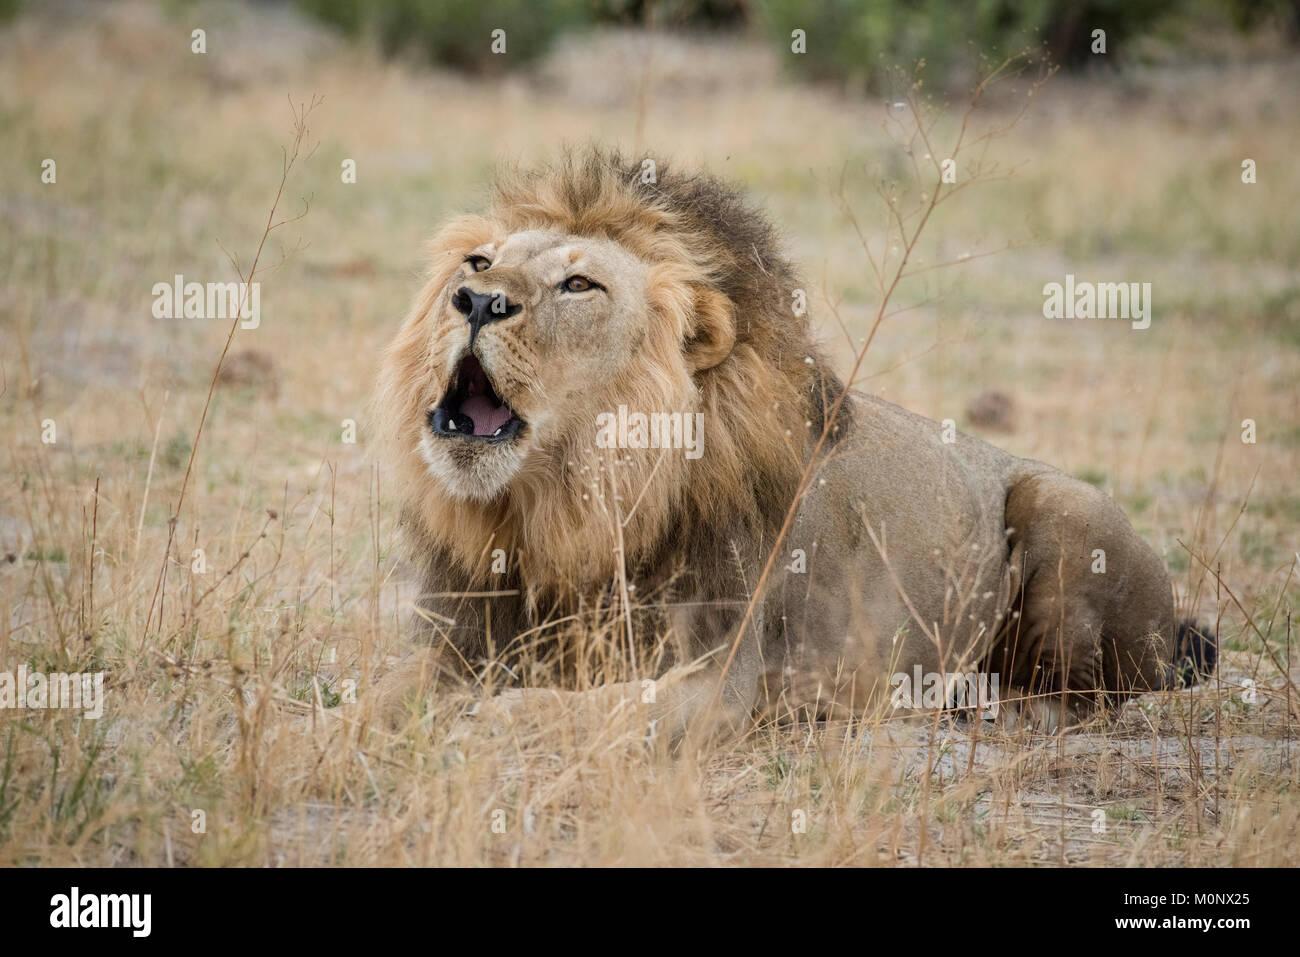 Lion (Panthera leo) roars,male is lying in dry grass and roars,Savuti,Chobe National Park,Chobe District,Botswana - Stock Image